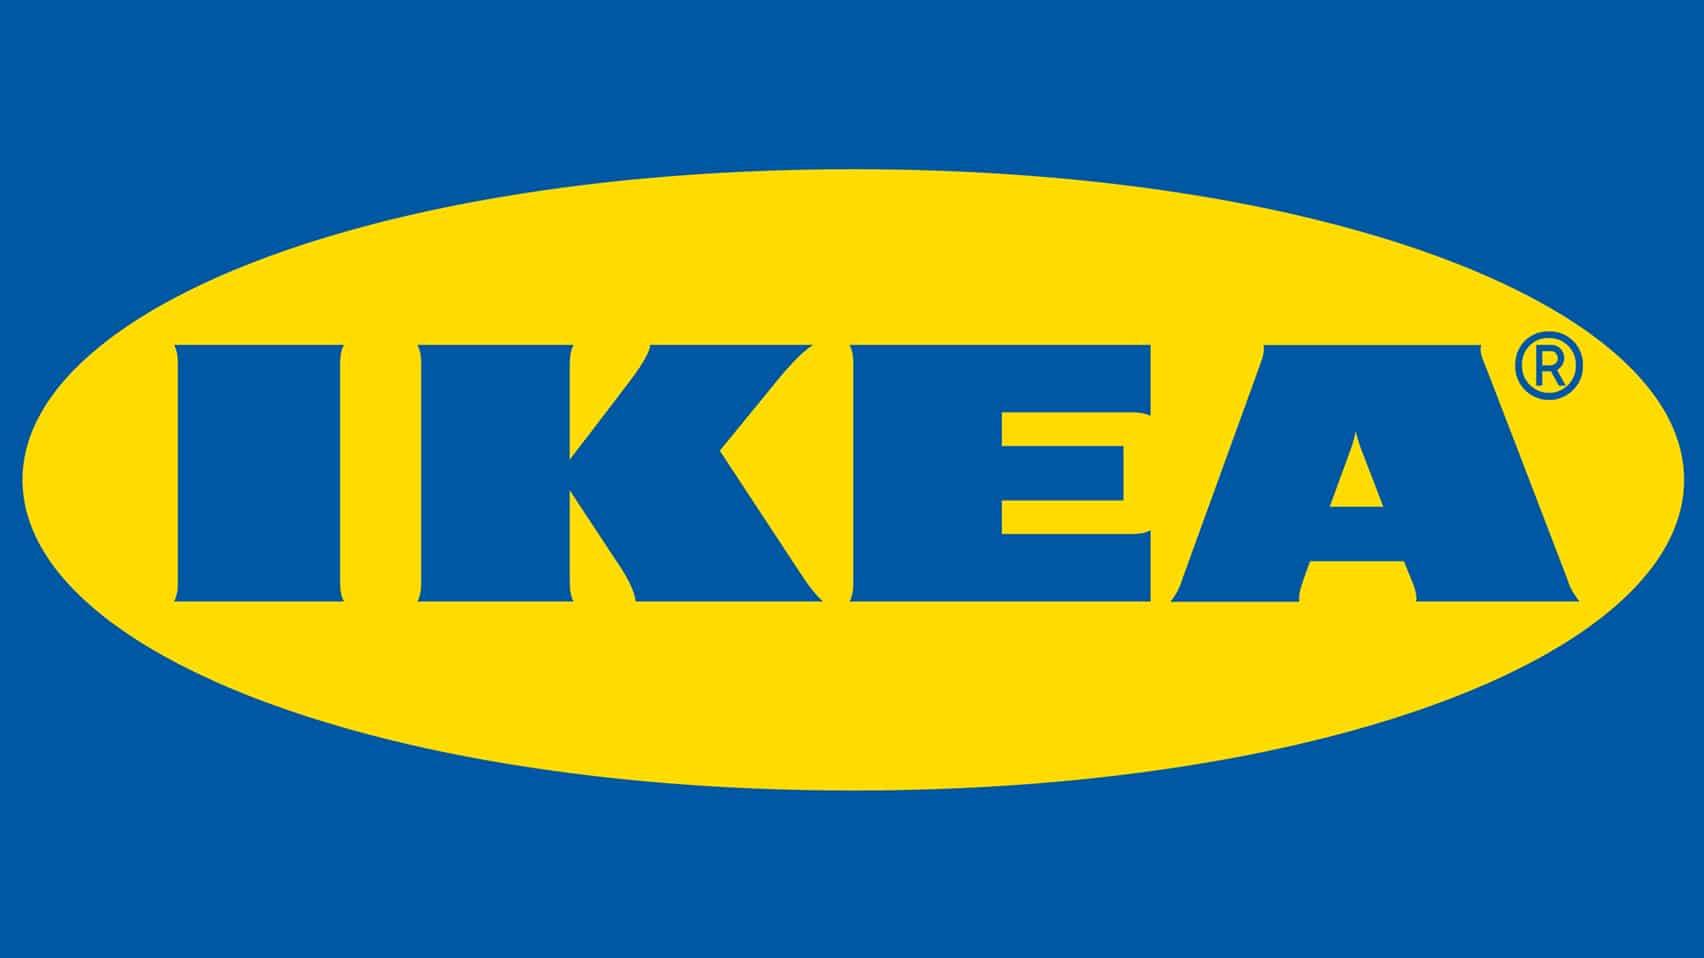 ikea : Brand Short Description Type Here.